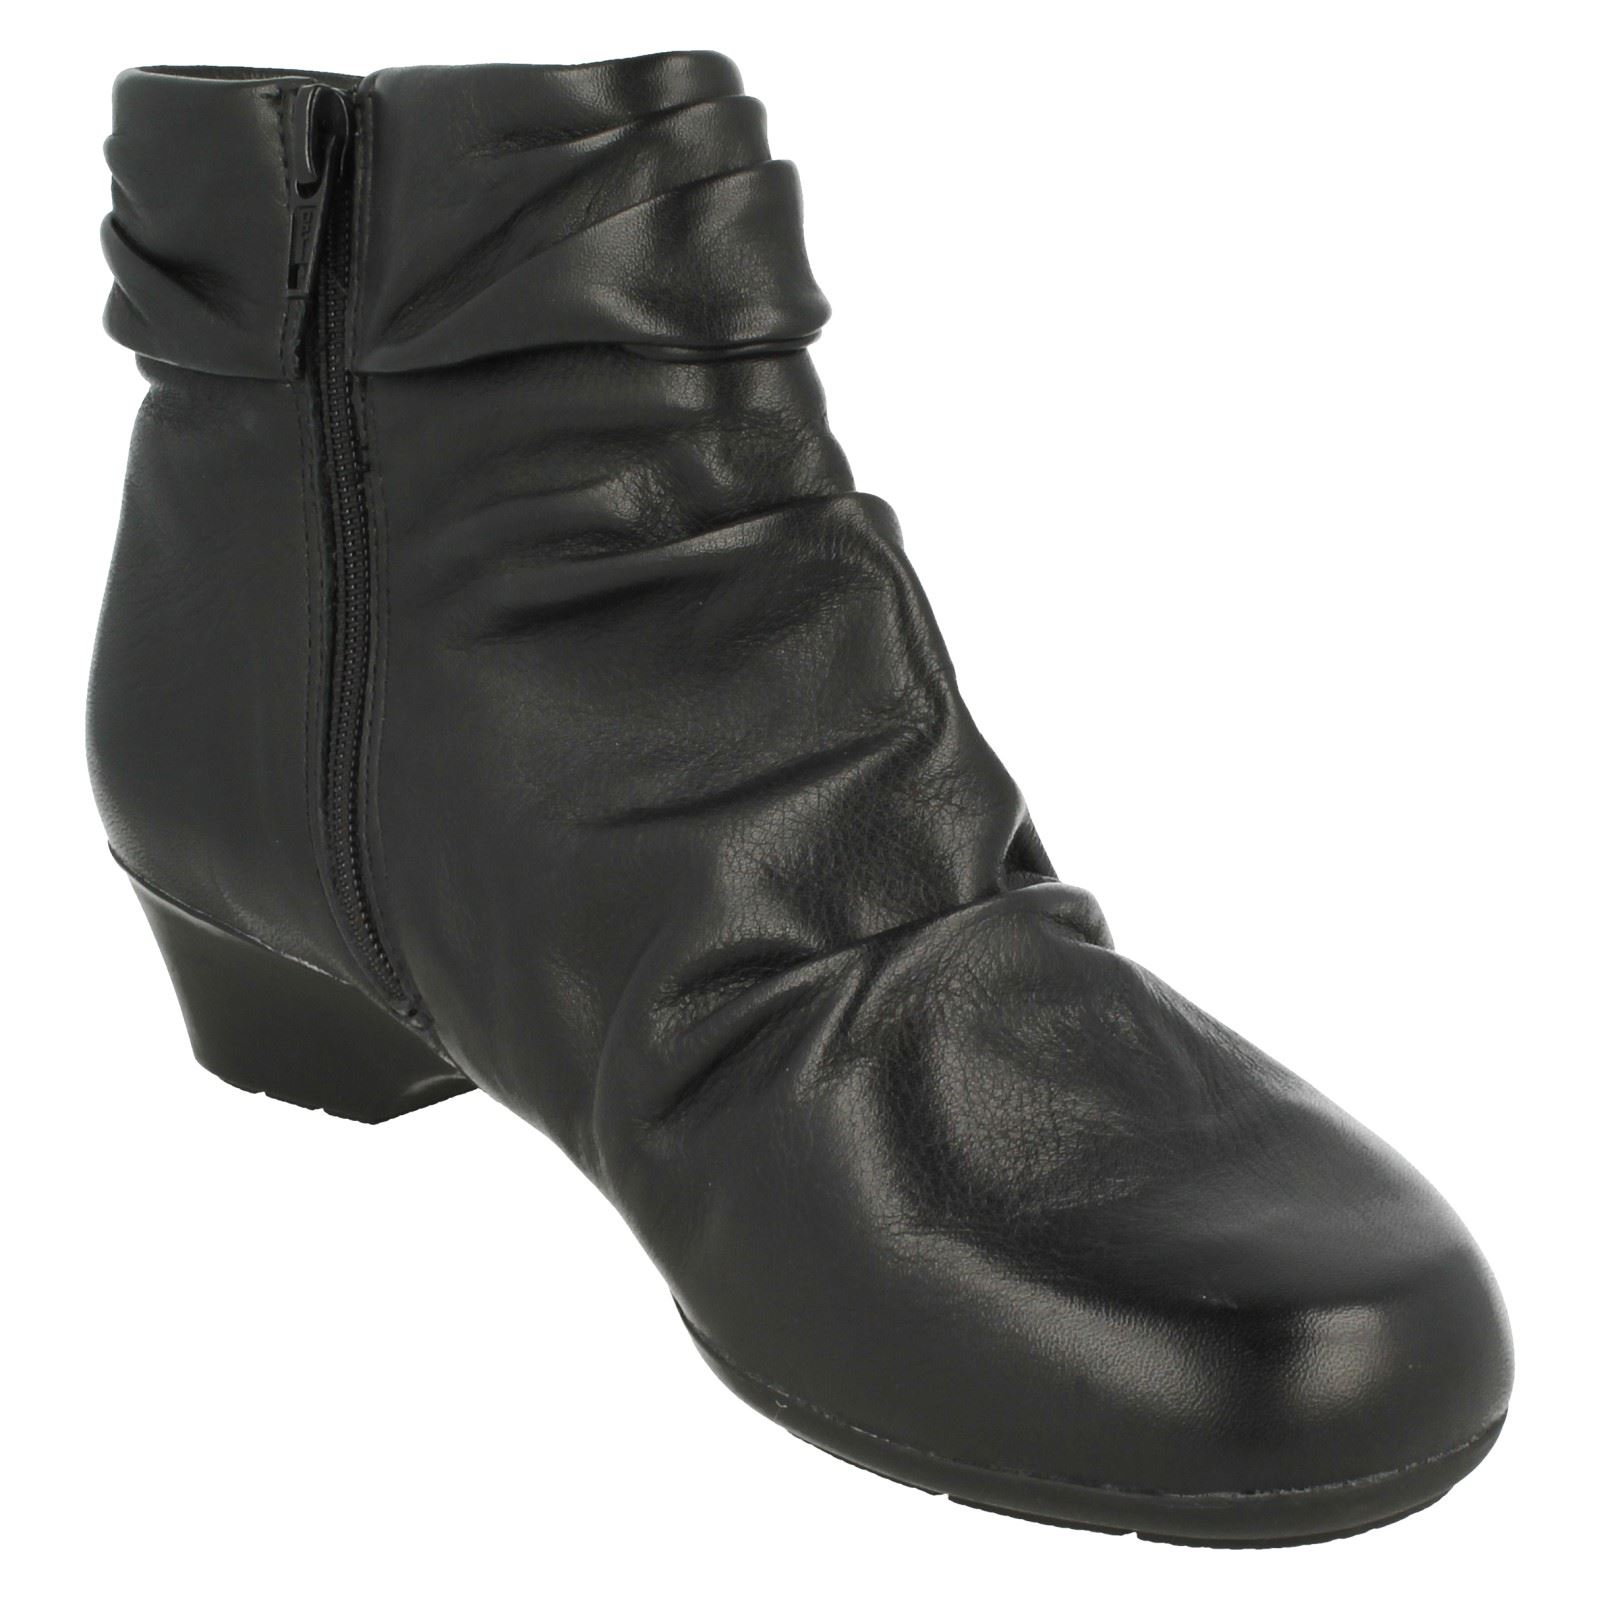 Ladies-K-By-Clarks-Matron-Ella-Ankle-Boots